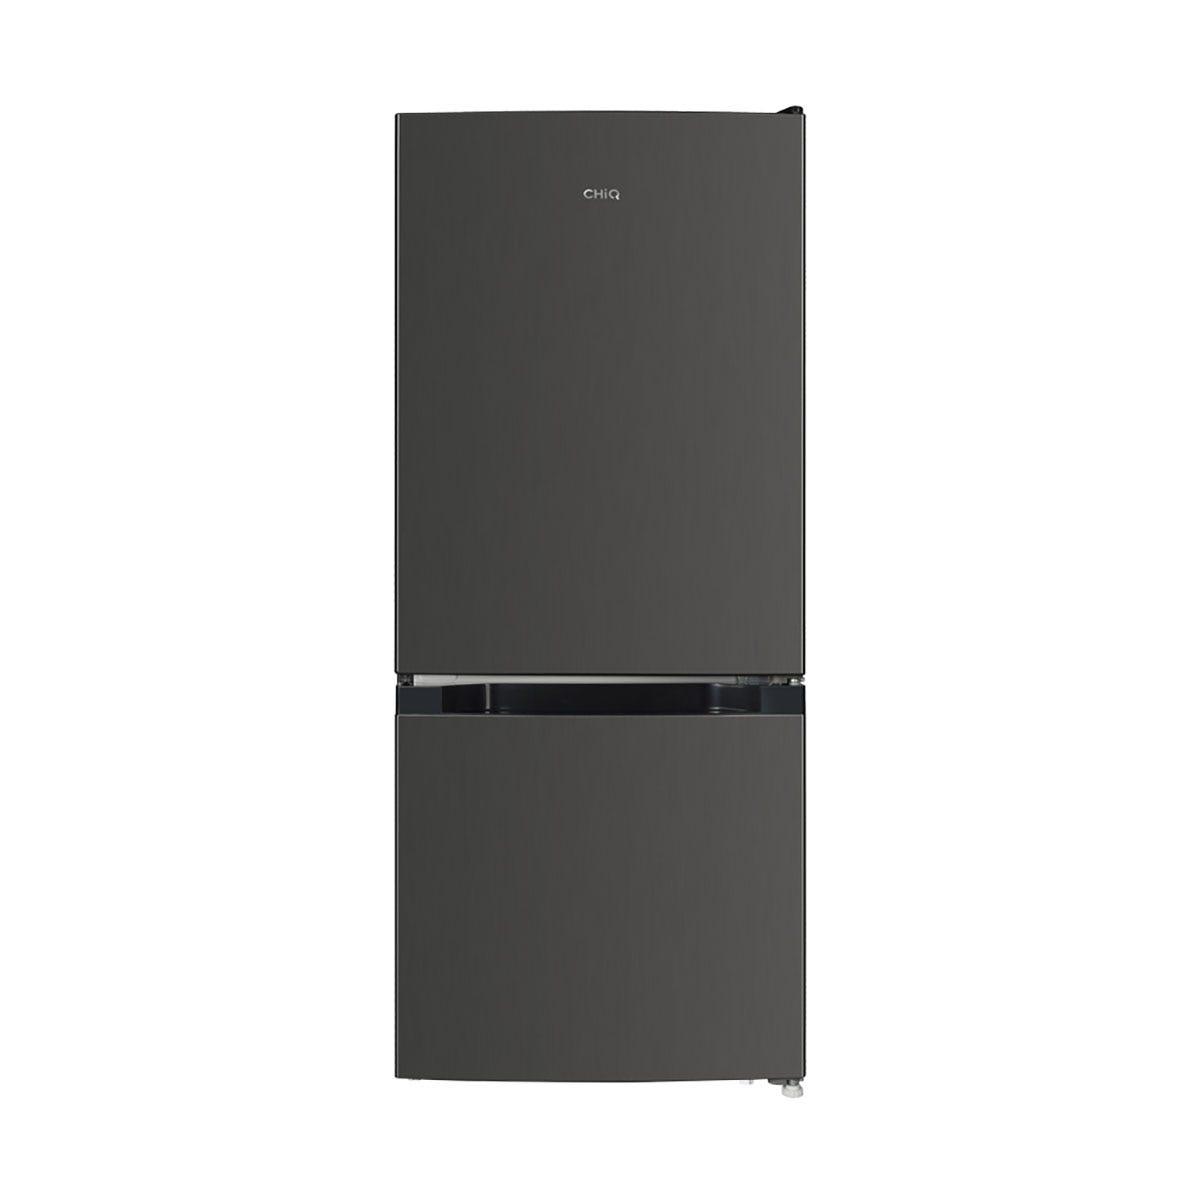 CHiQ CBM120L42 117L Freestanding Fridge Freezer - Dark Inox